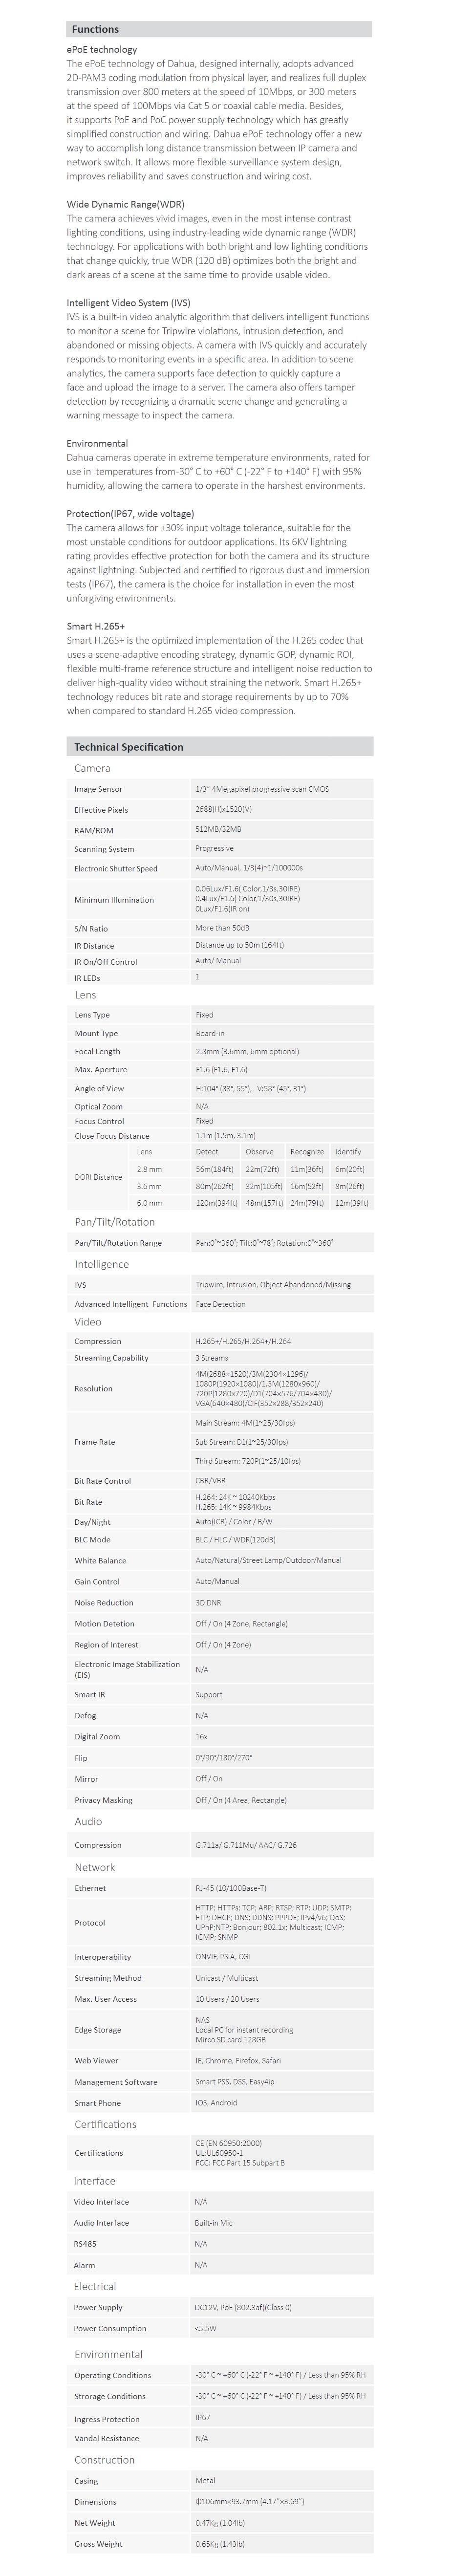 Dahua 4MP Full HD IR Eyeball Network Camera - Overview 1